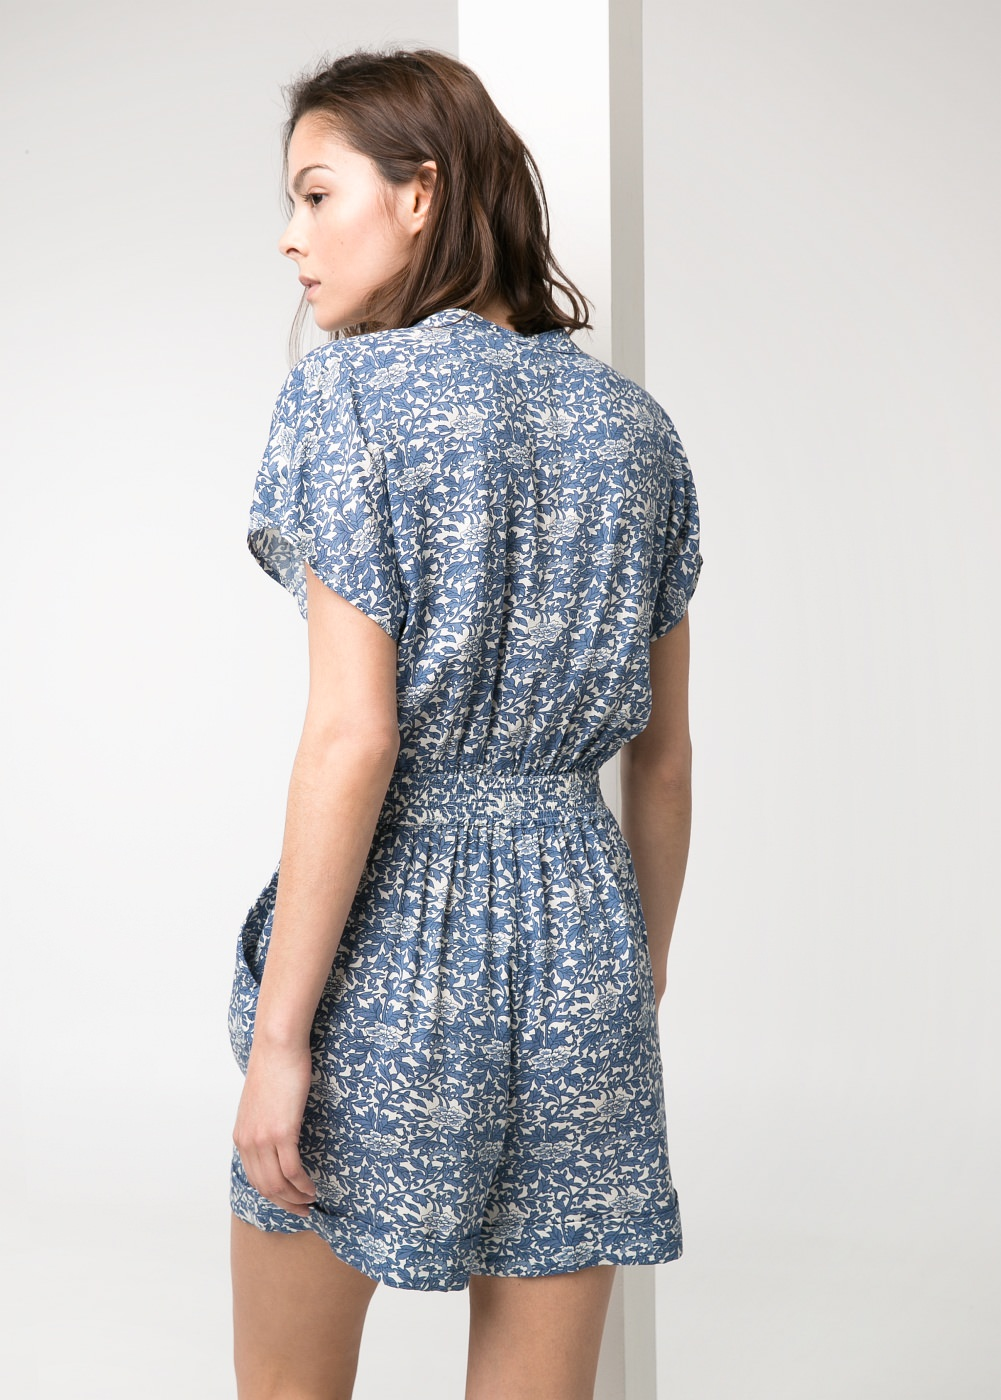 Printed short jumpsuit -  Dresses - Women - MANGO